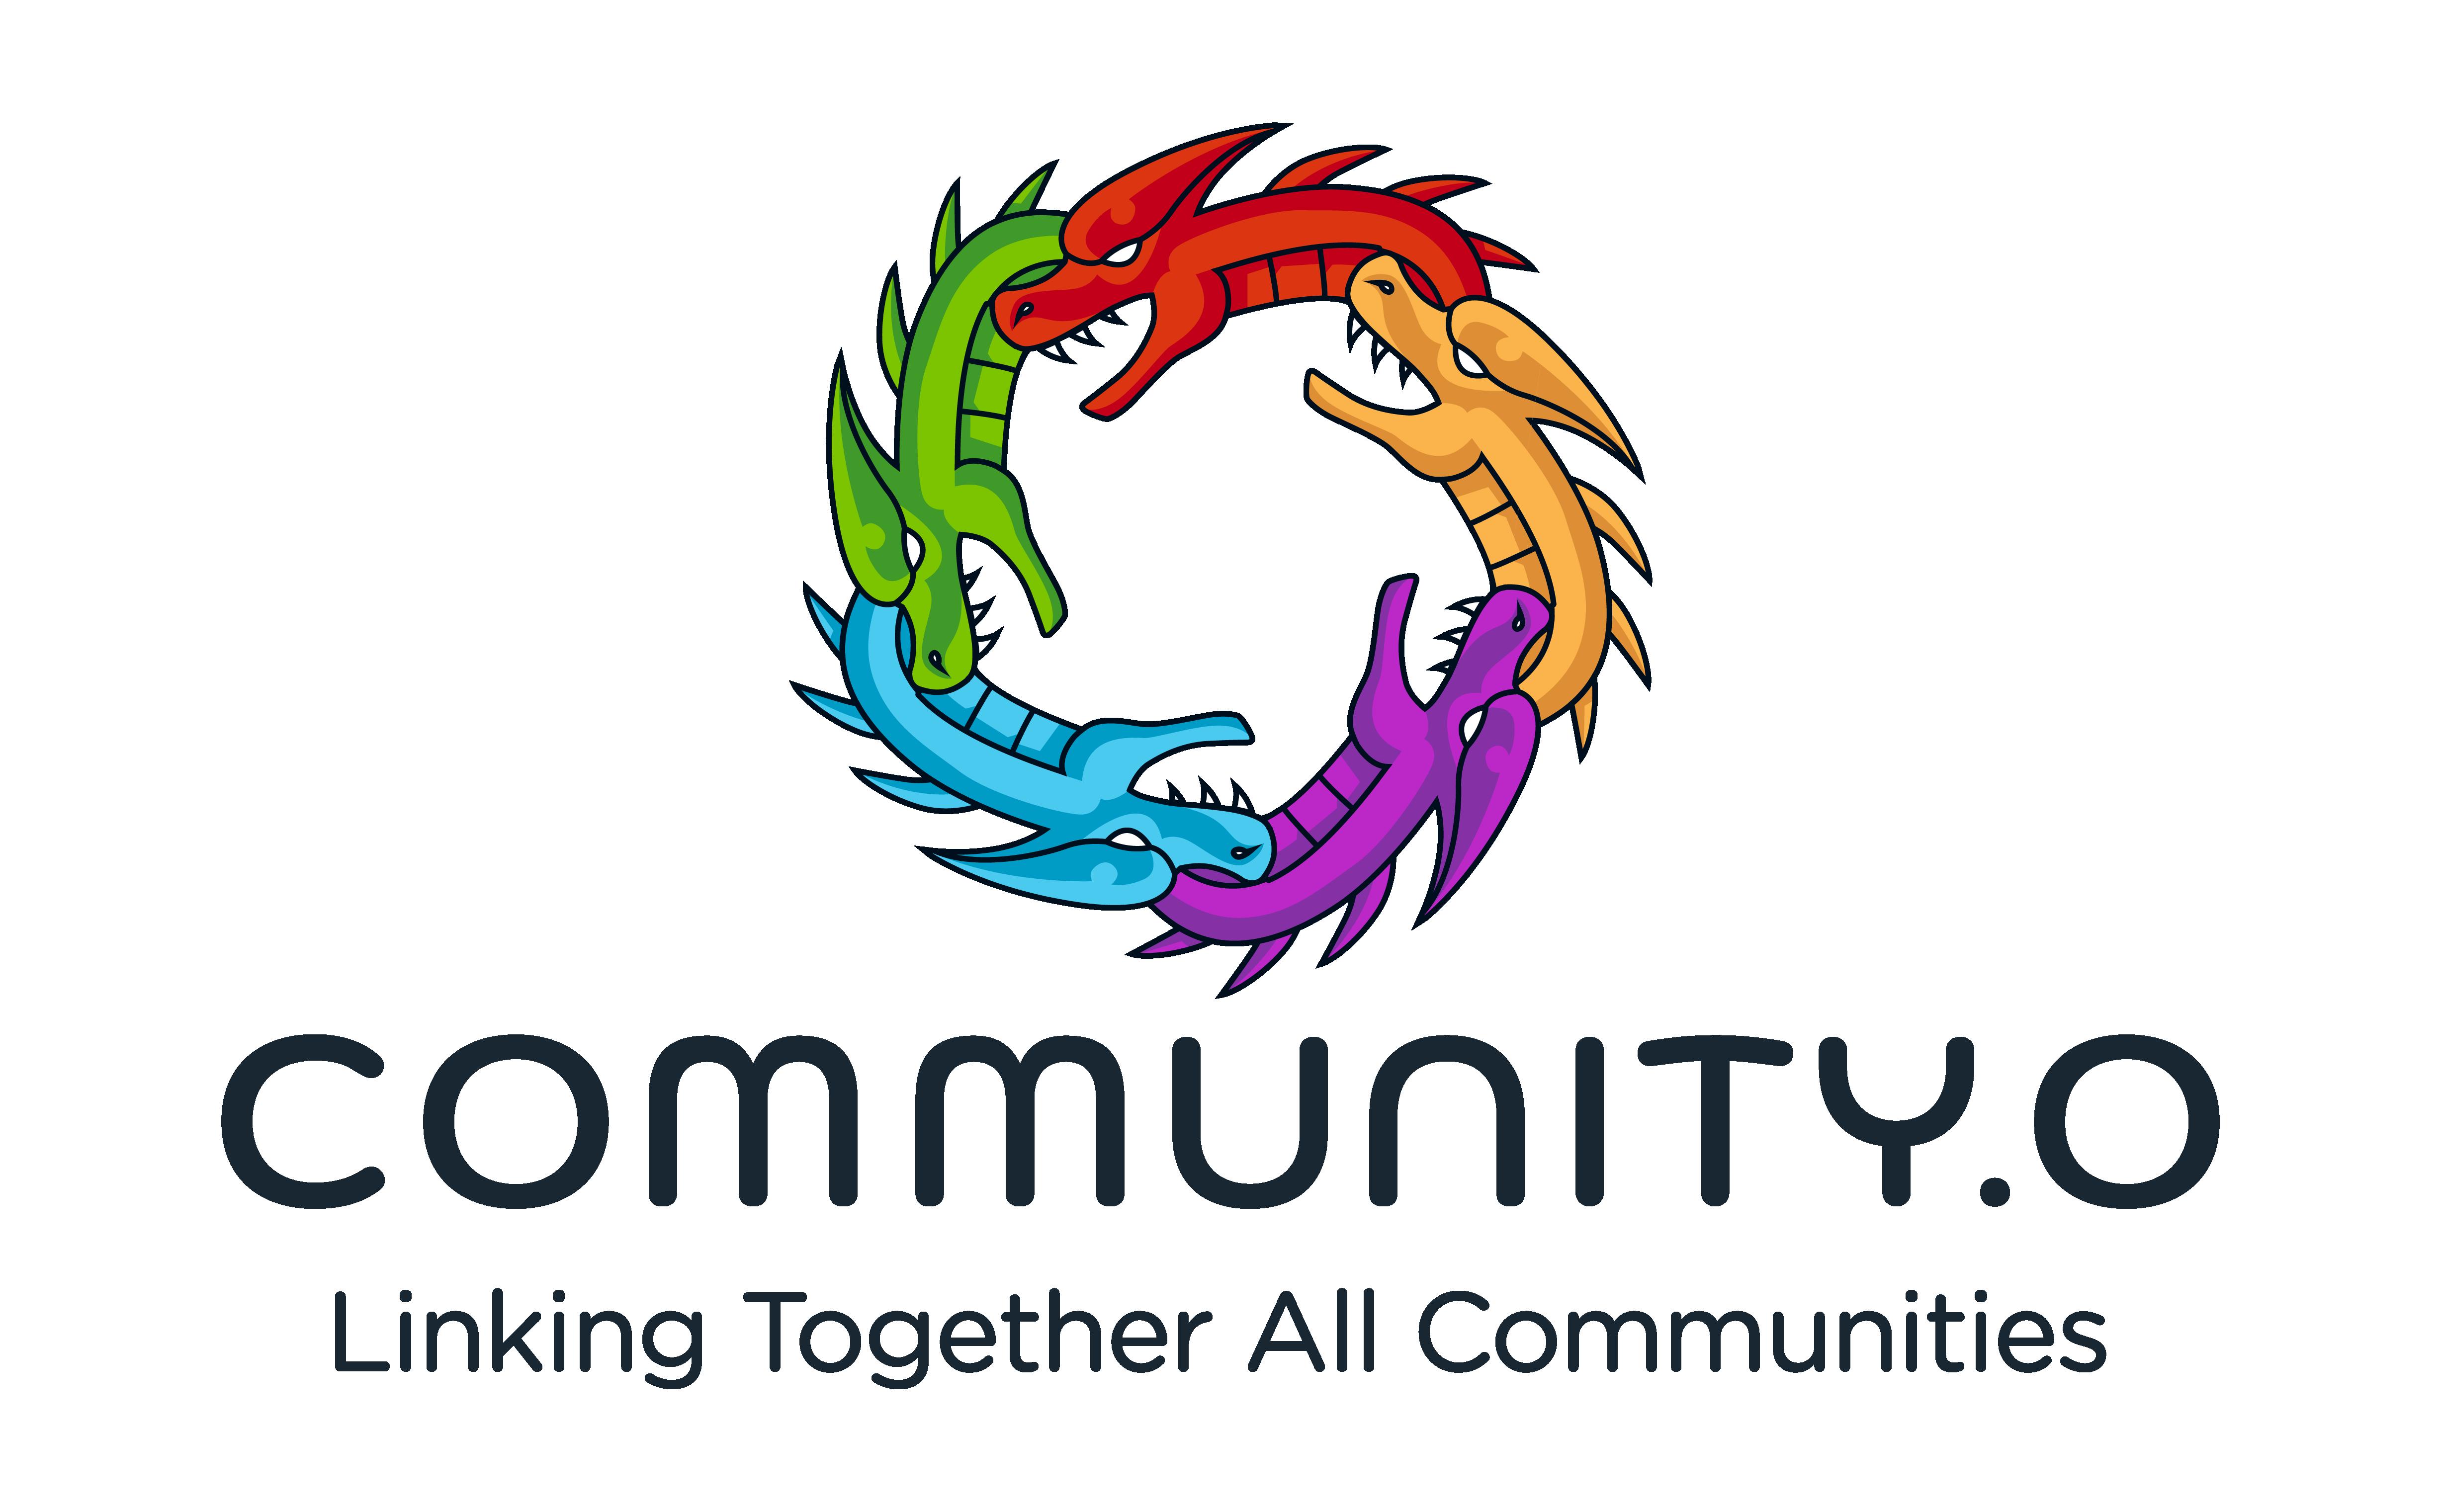 Community.o